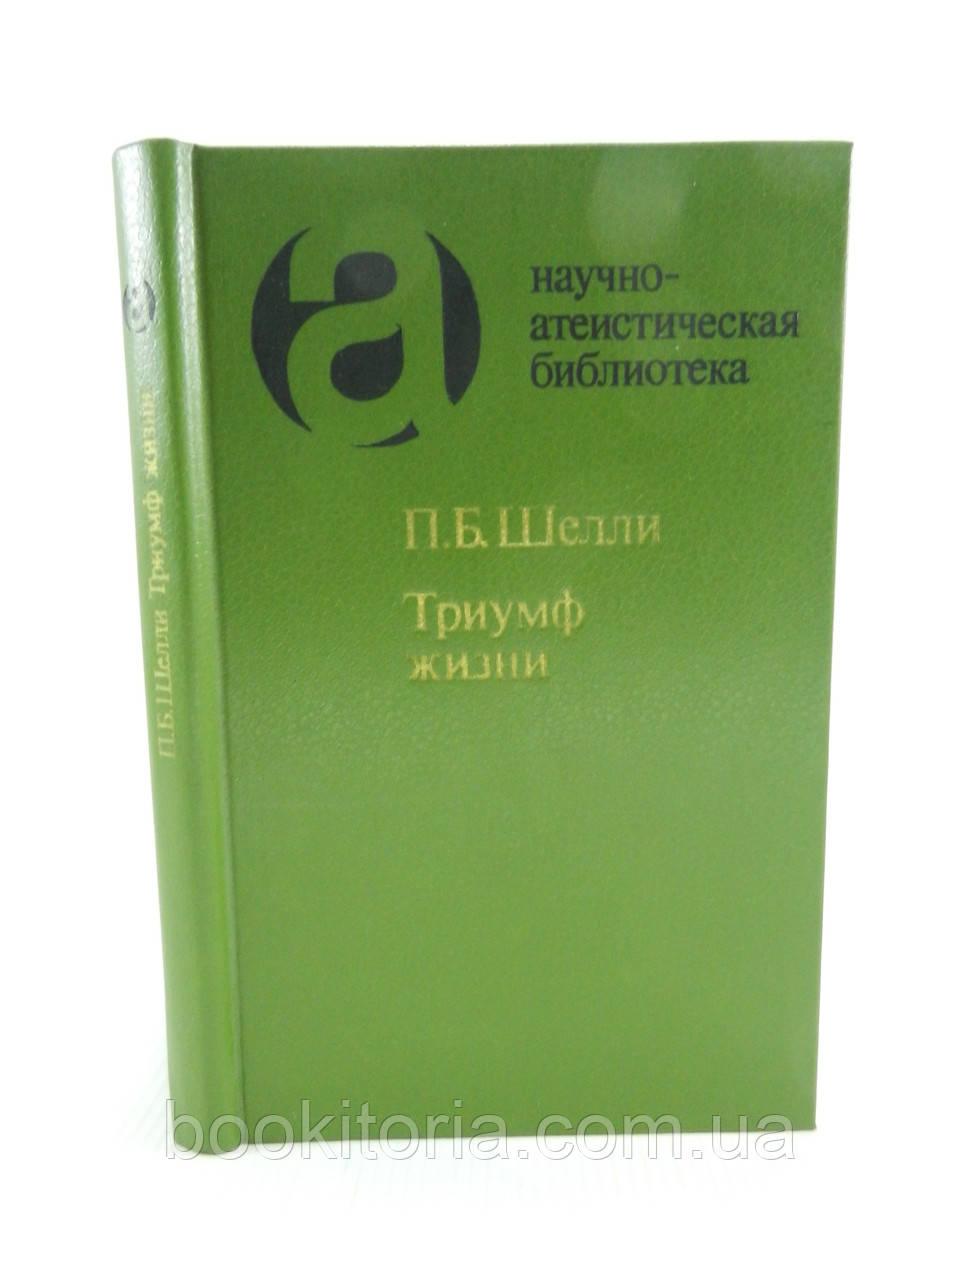 Шелли П. Триумф жизни (б/у).